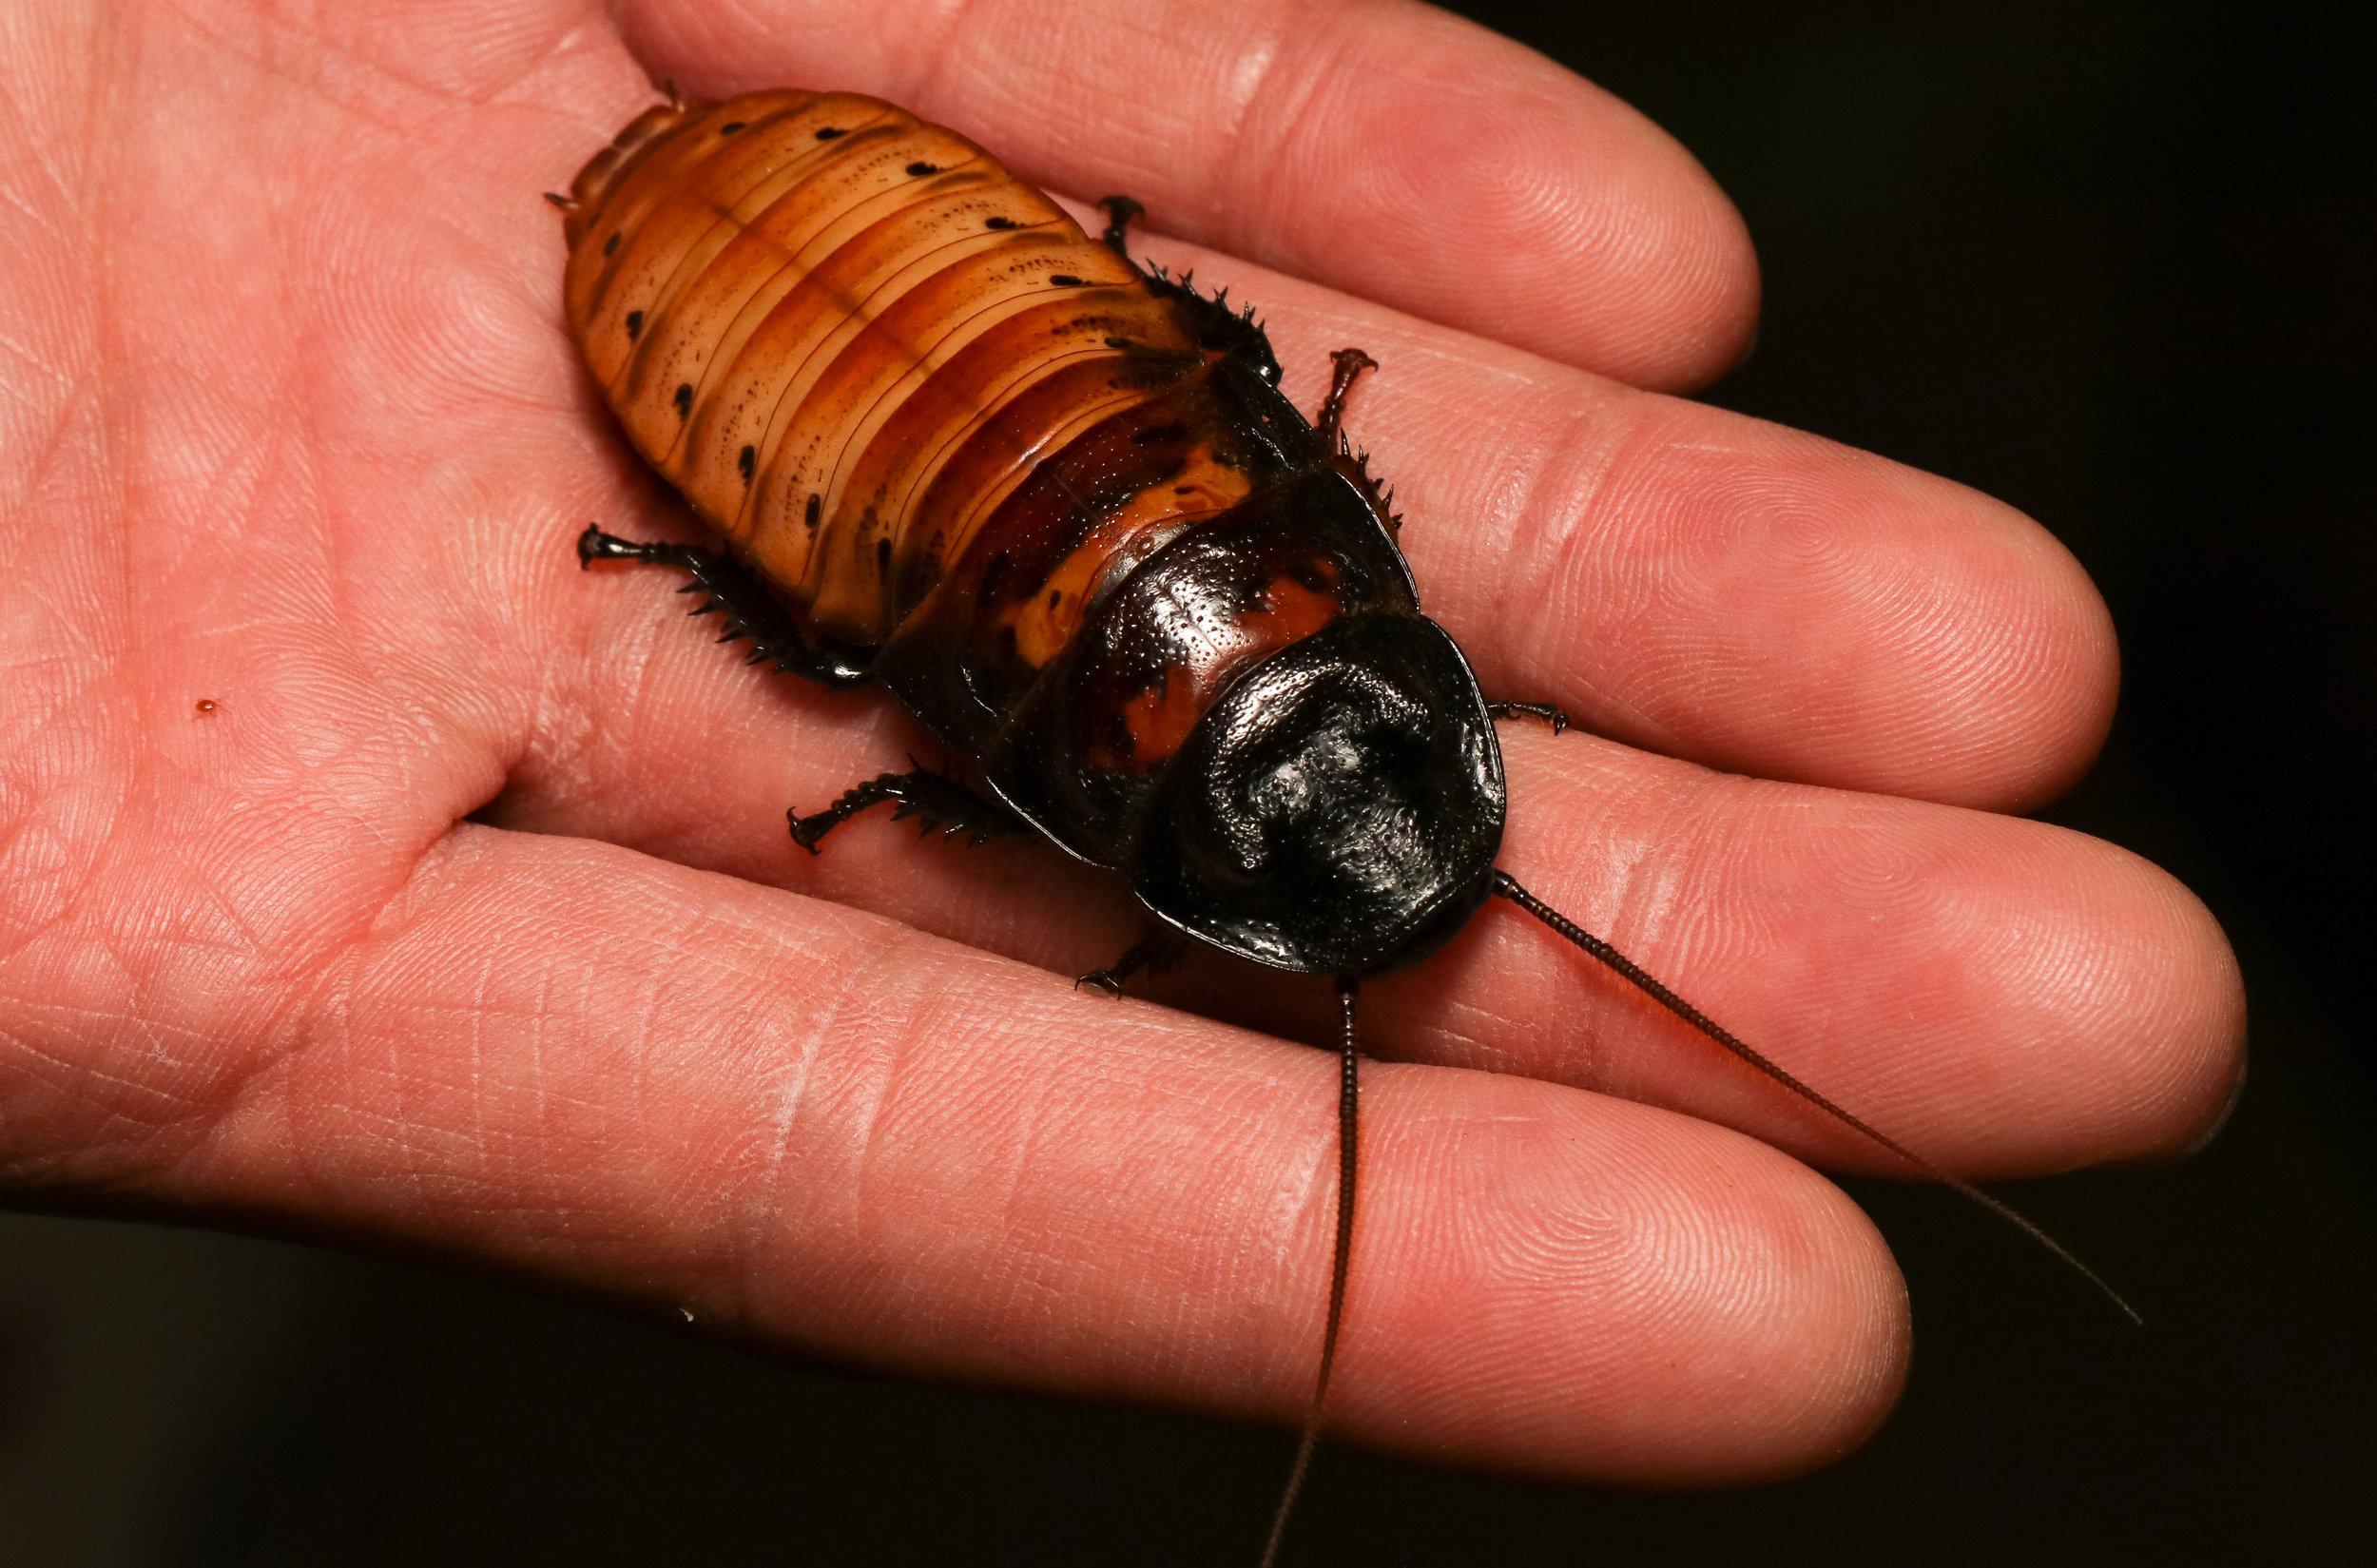 Malagasy Hissing Cockroach (Gromphadorhina portentosa)